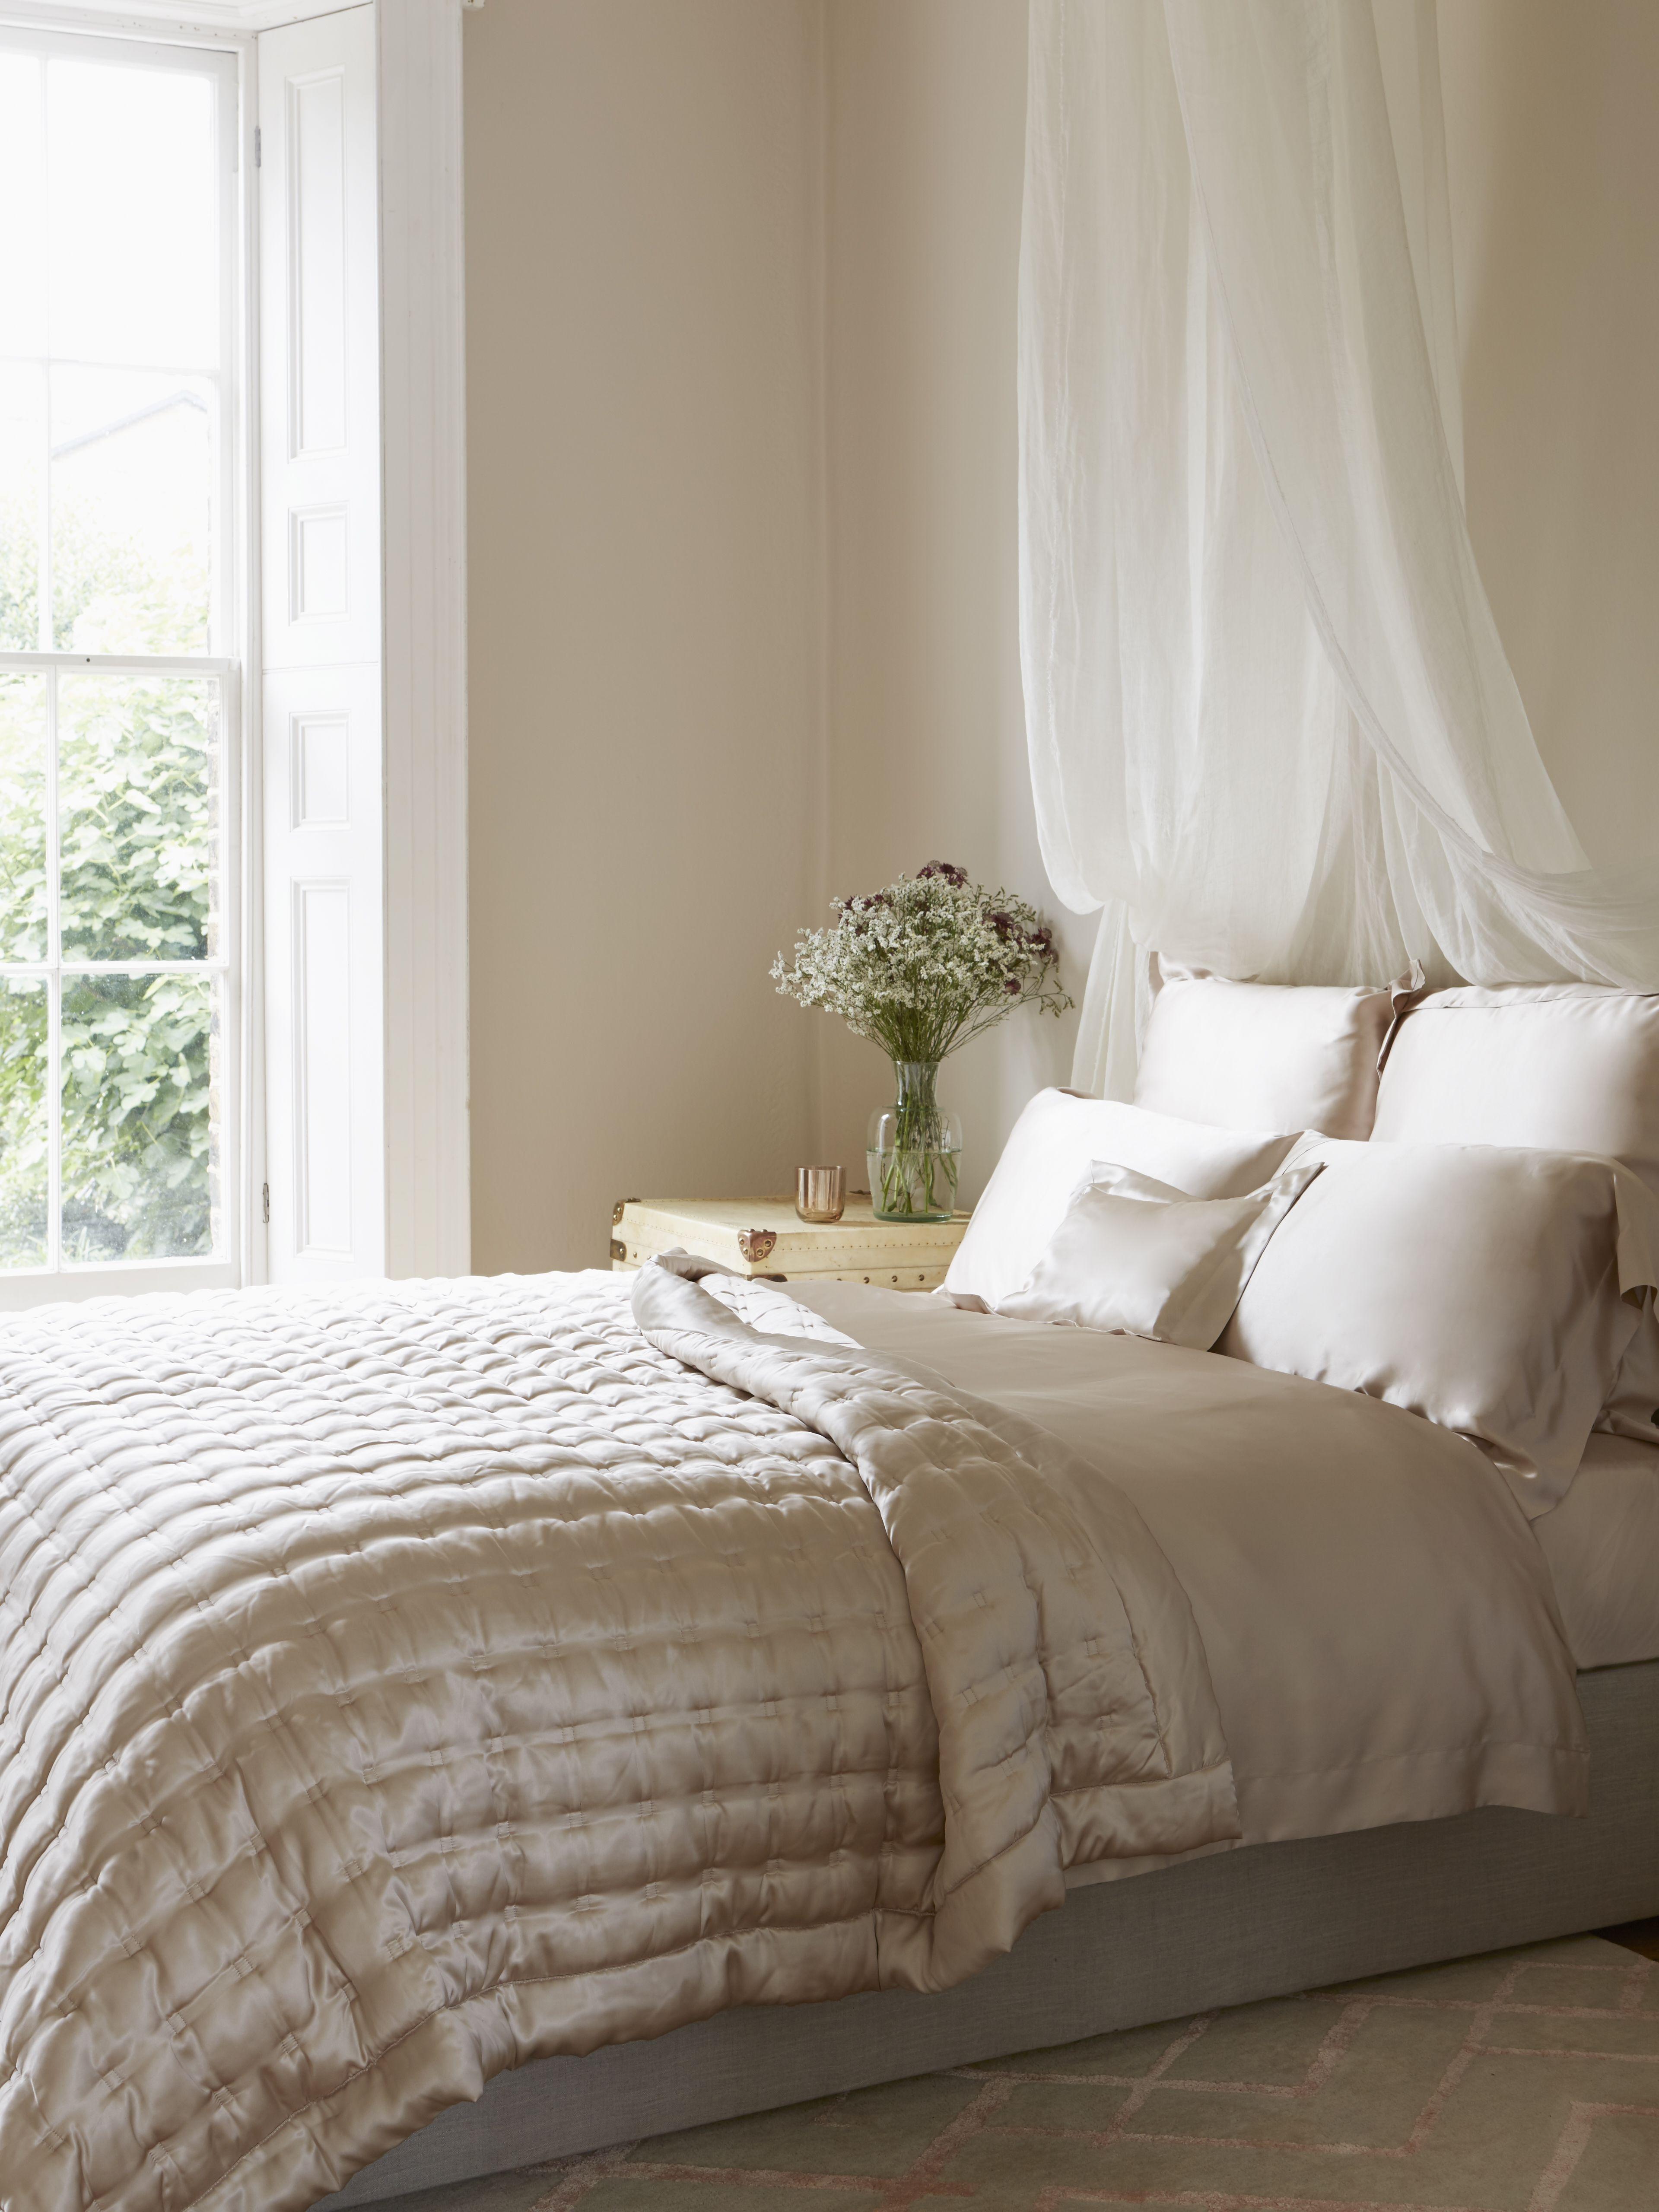 silk grey pinterest mulberry apartments pin bedroom bedspread comforter